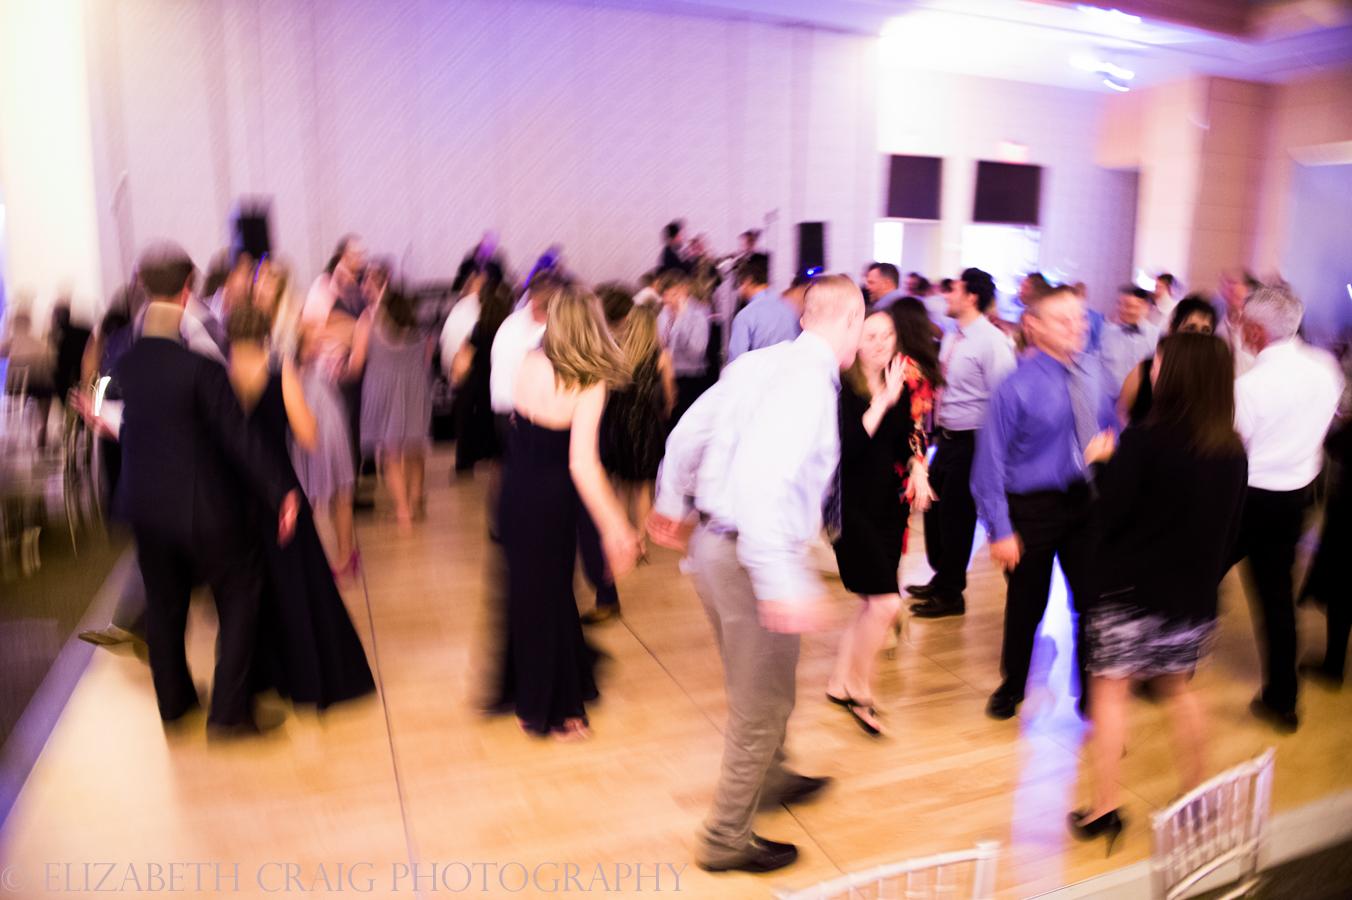 pittsburgh-greek-weddings-fairmont-weddings-receptions-elizabeth-craig-photohgraphy-034